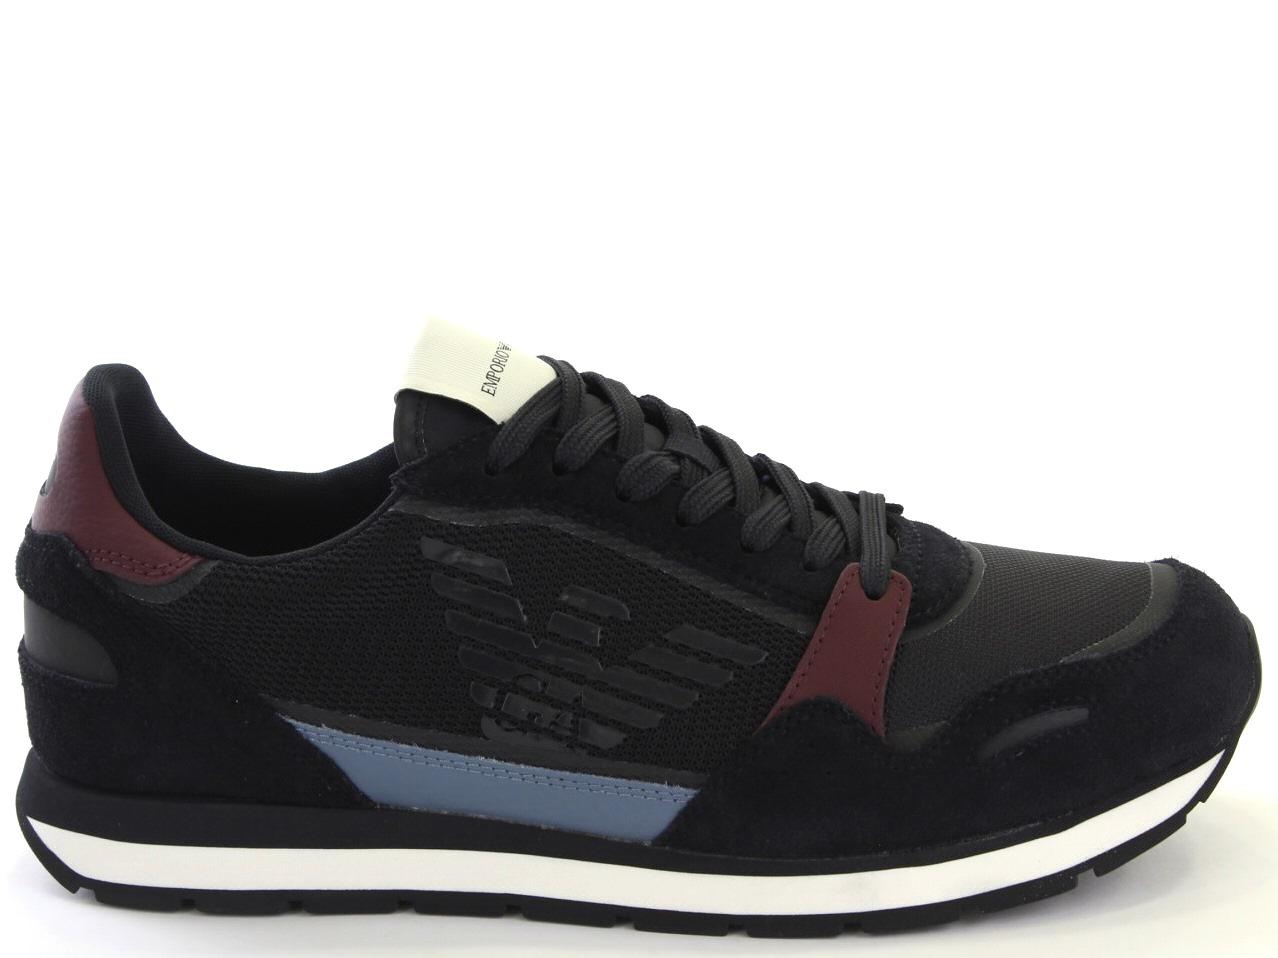 Sneakers, Espadrilles Armani, Emporio - 529 X4X537 XM678 Q441